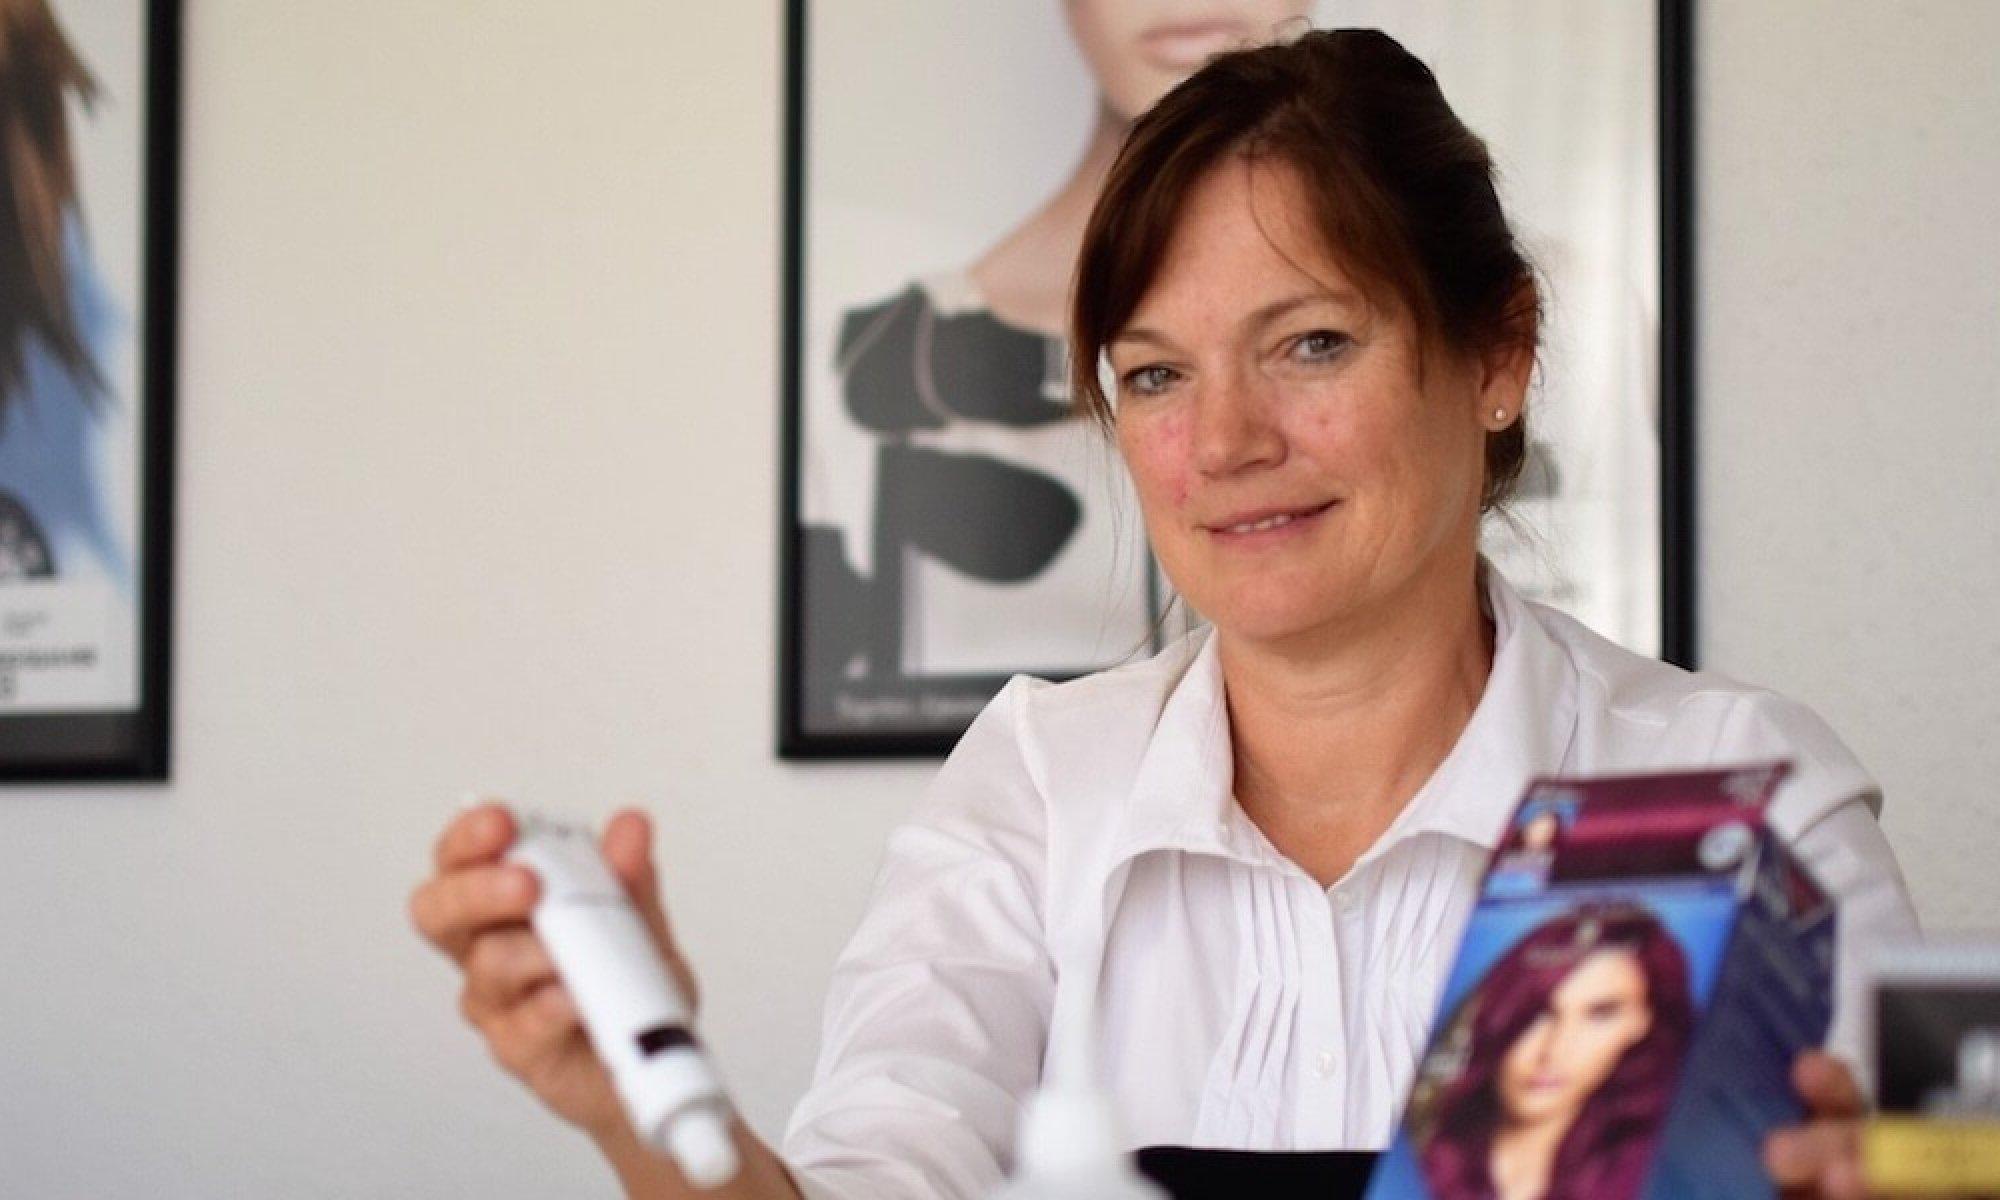 Schwarzkopf & Henkel Dr. Preis-Amberger